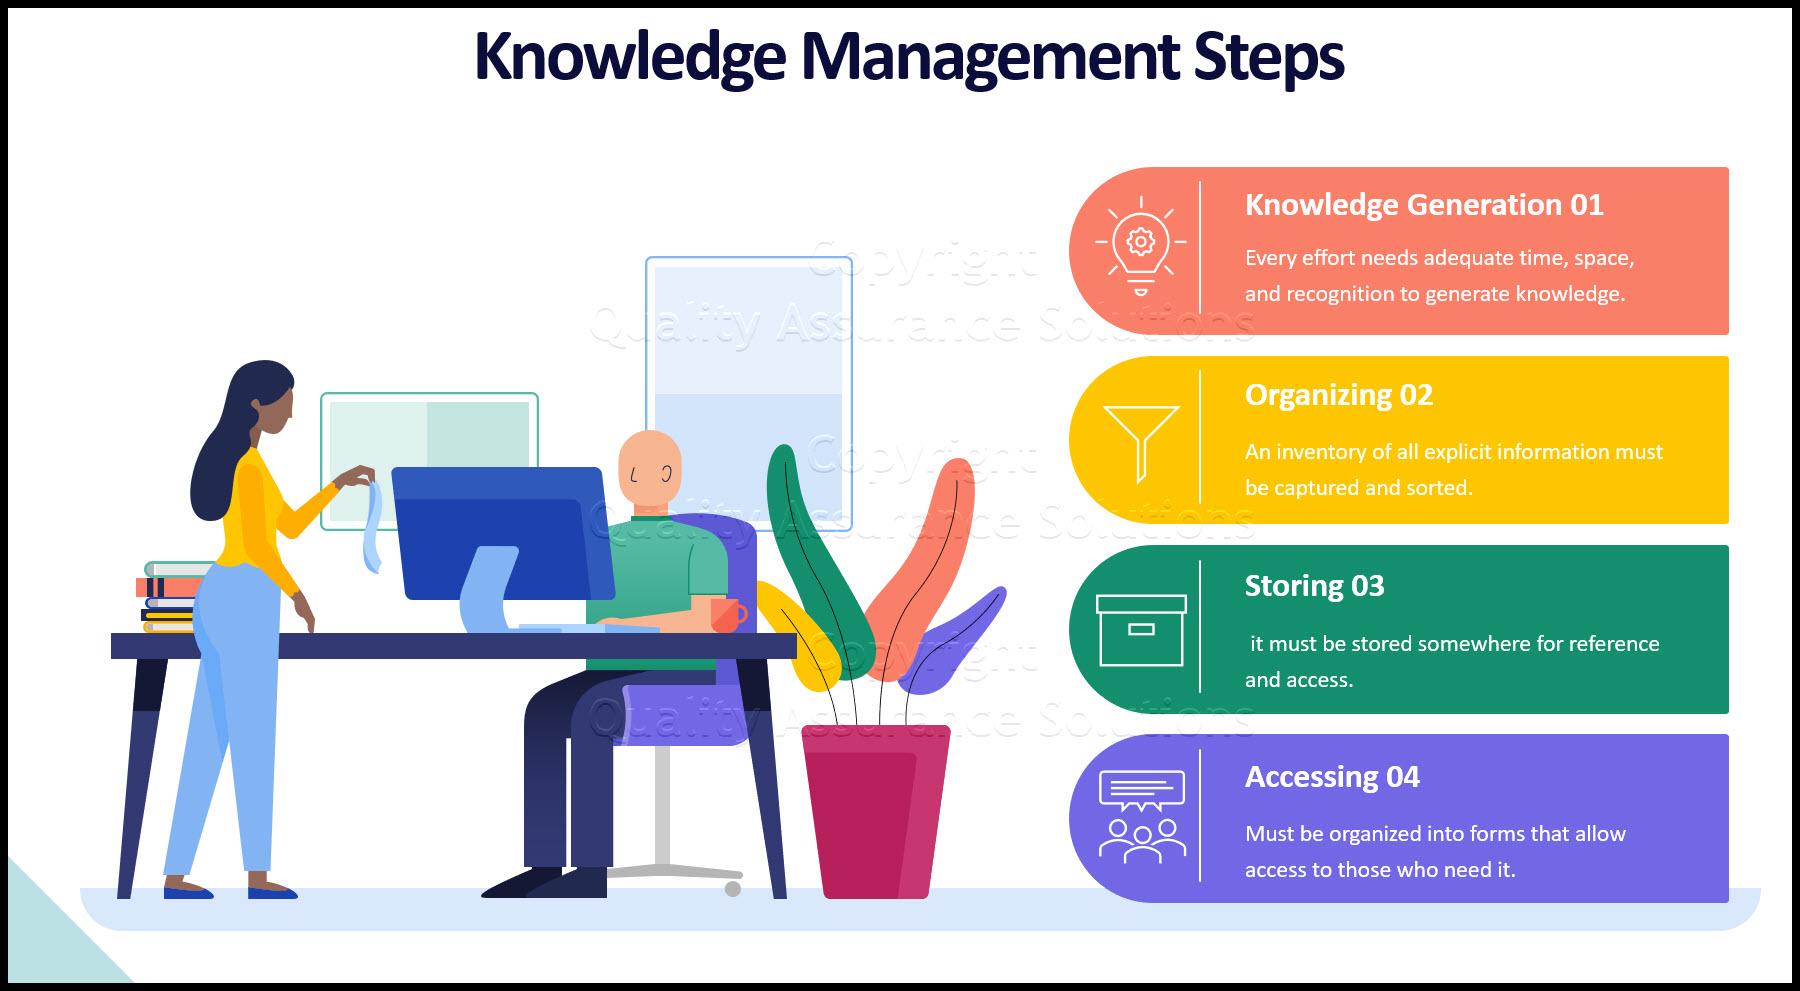 Planning for Knowledge Management business slide